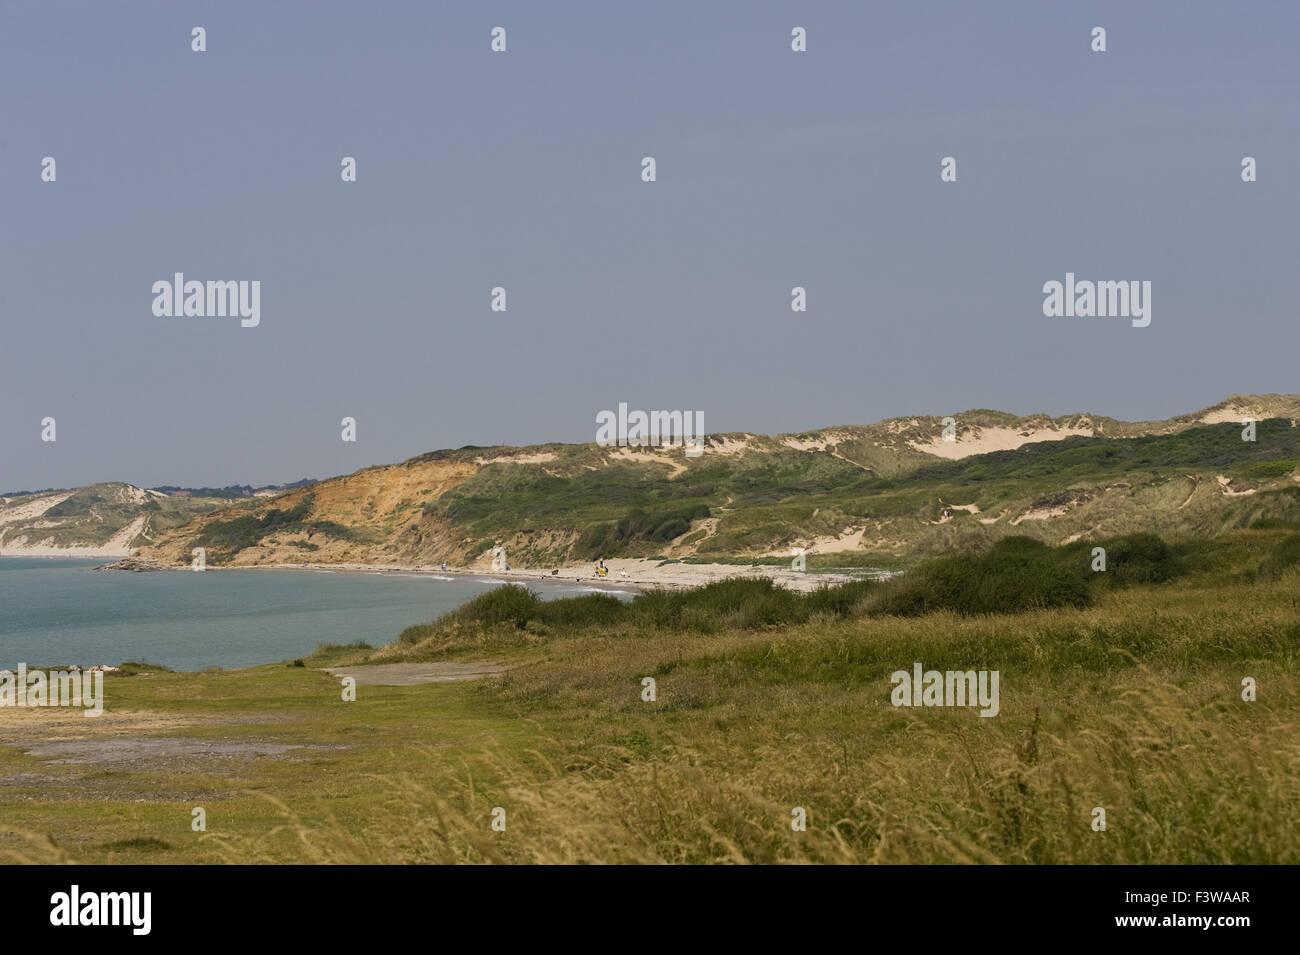 Dune de la Slack - Stock Image